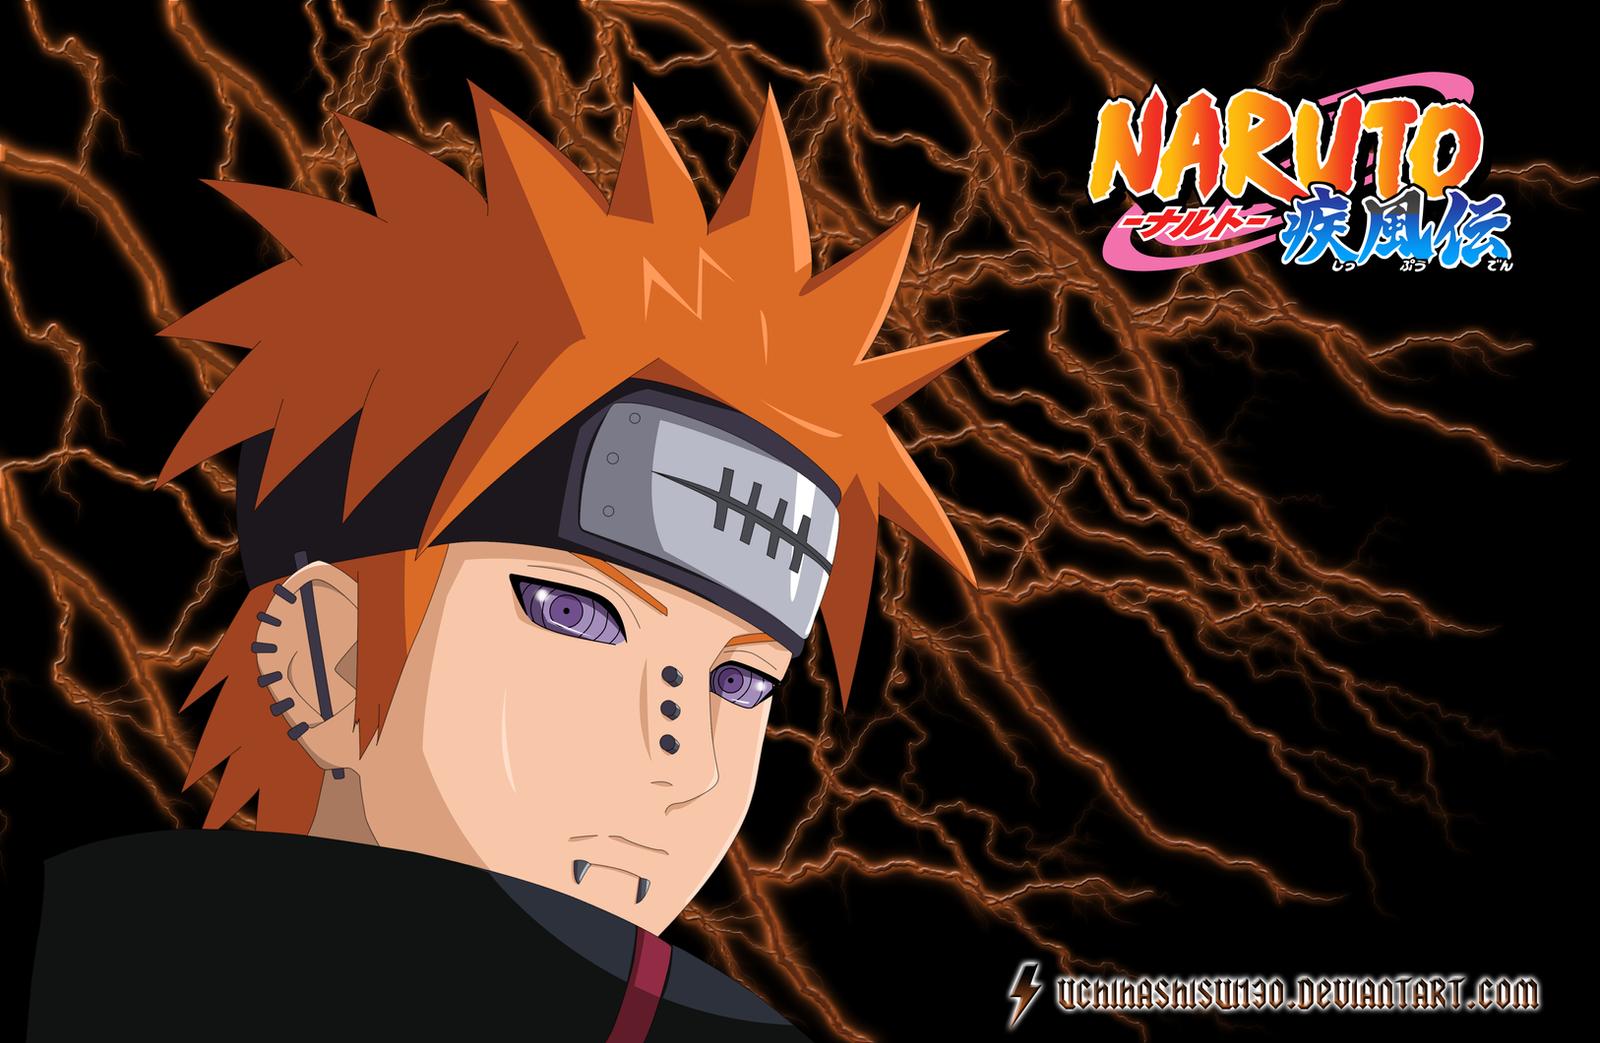 Great Wallpaper Naruto Deviantart - pain_deva_path_wallpaper_by_uchihashisui130-d3gvx8v  Snapshot_533432.png